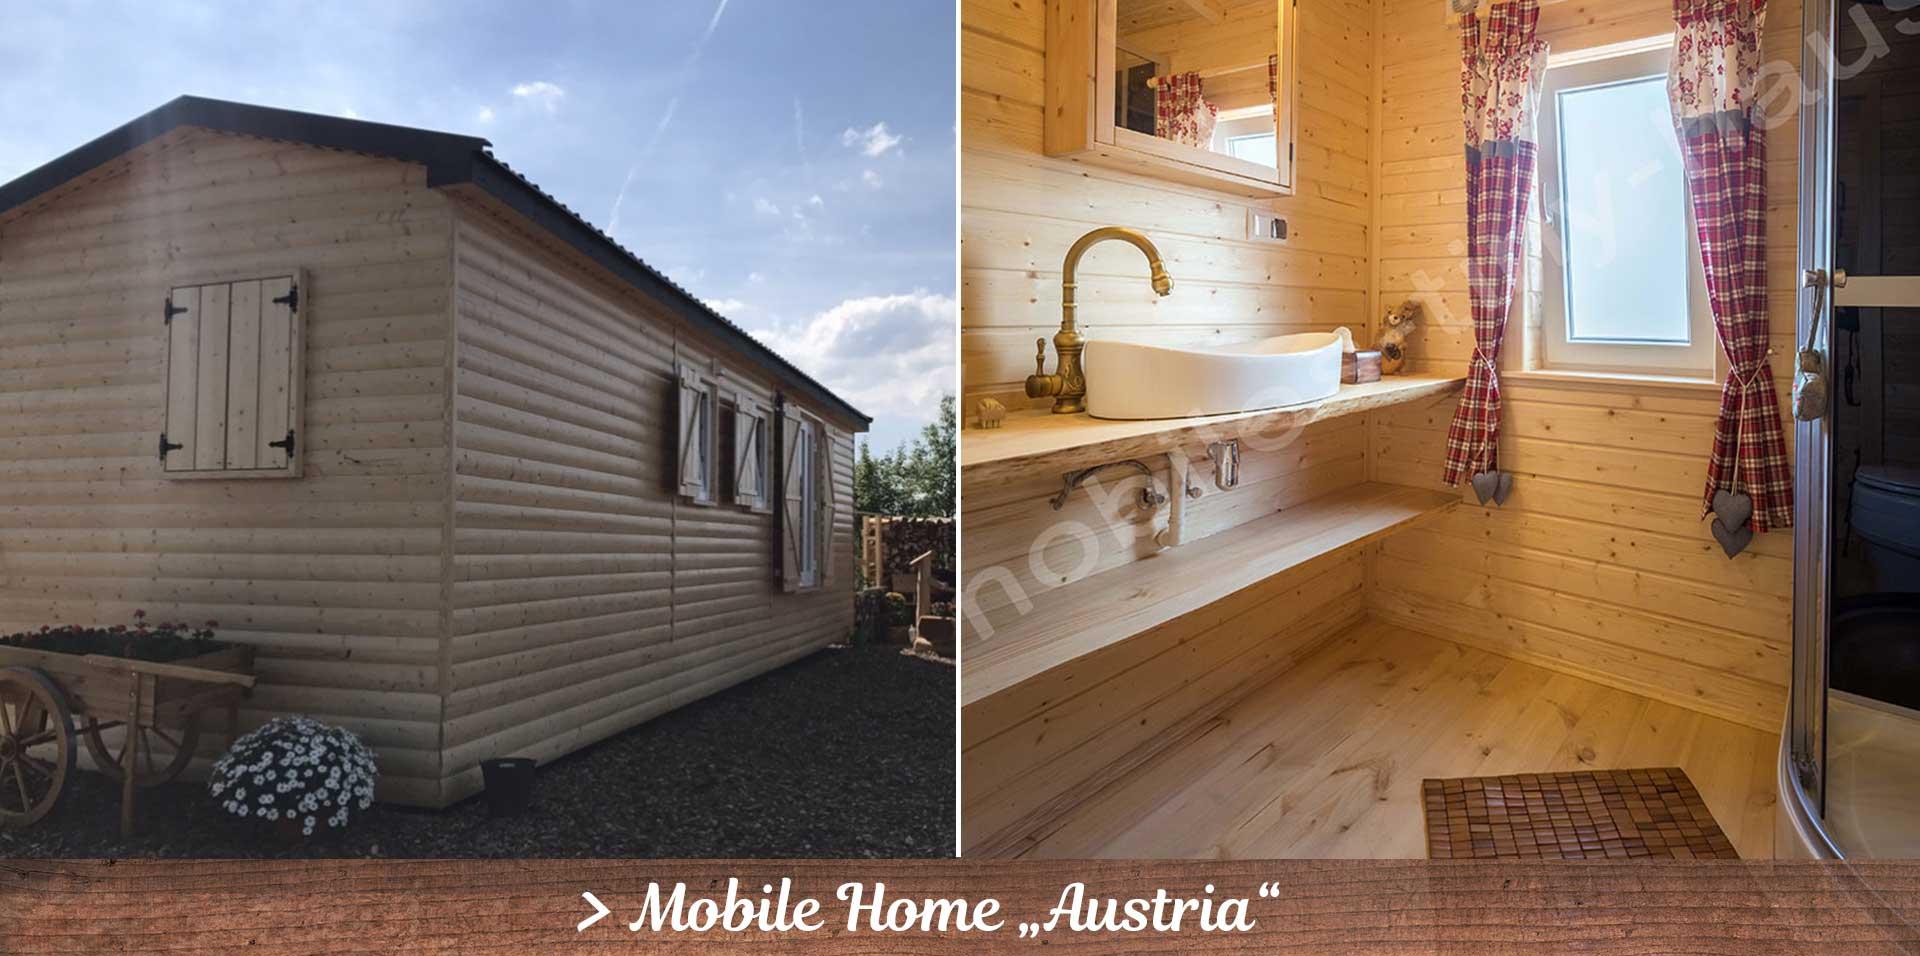 Zuhause an Ihrem Lieblingsort! | Mobiles Tiny House